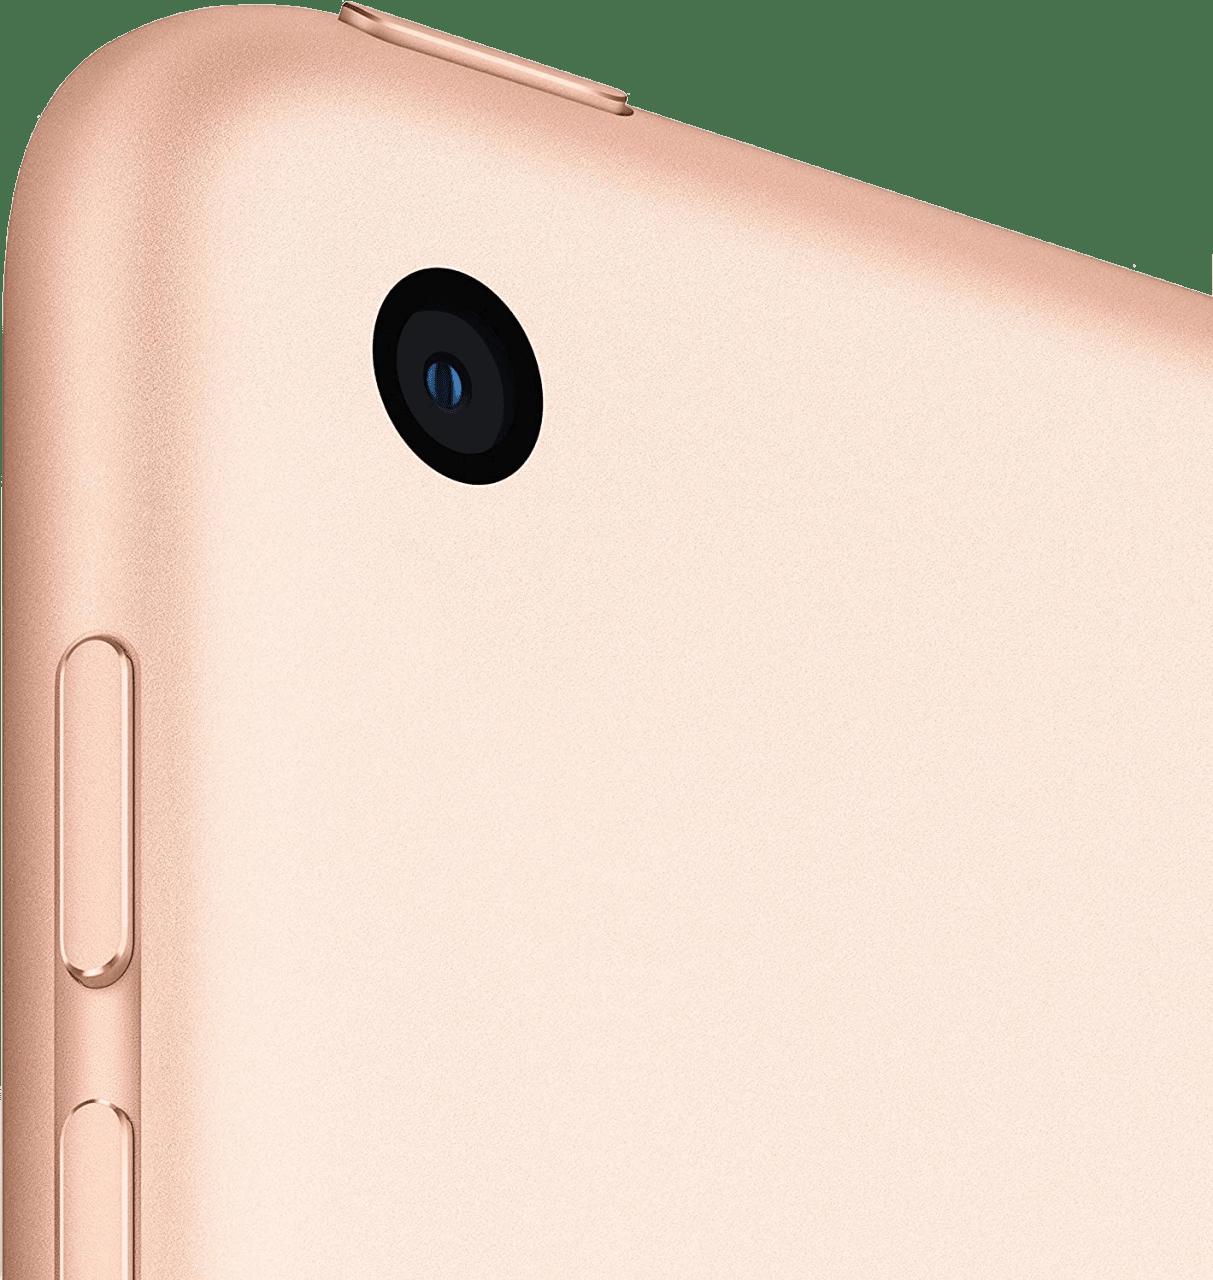 Gold Apple iPad (2020) - LTE - iOS14 - 32GB.3